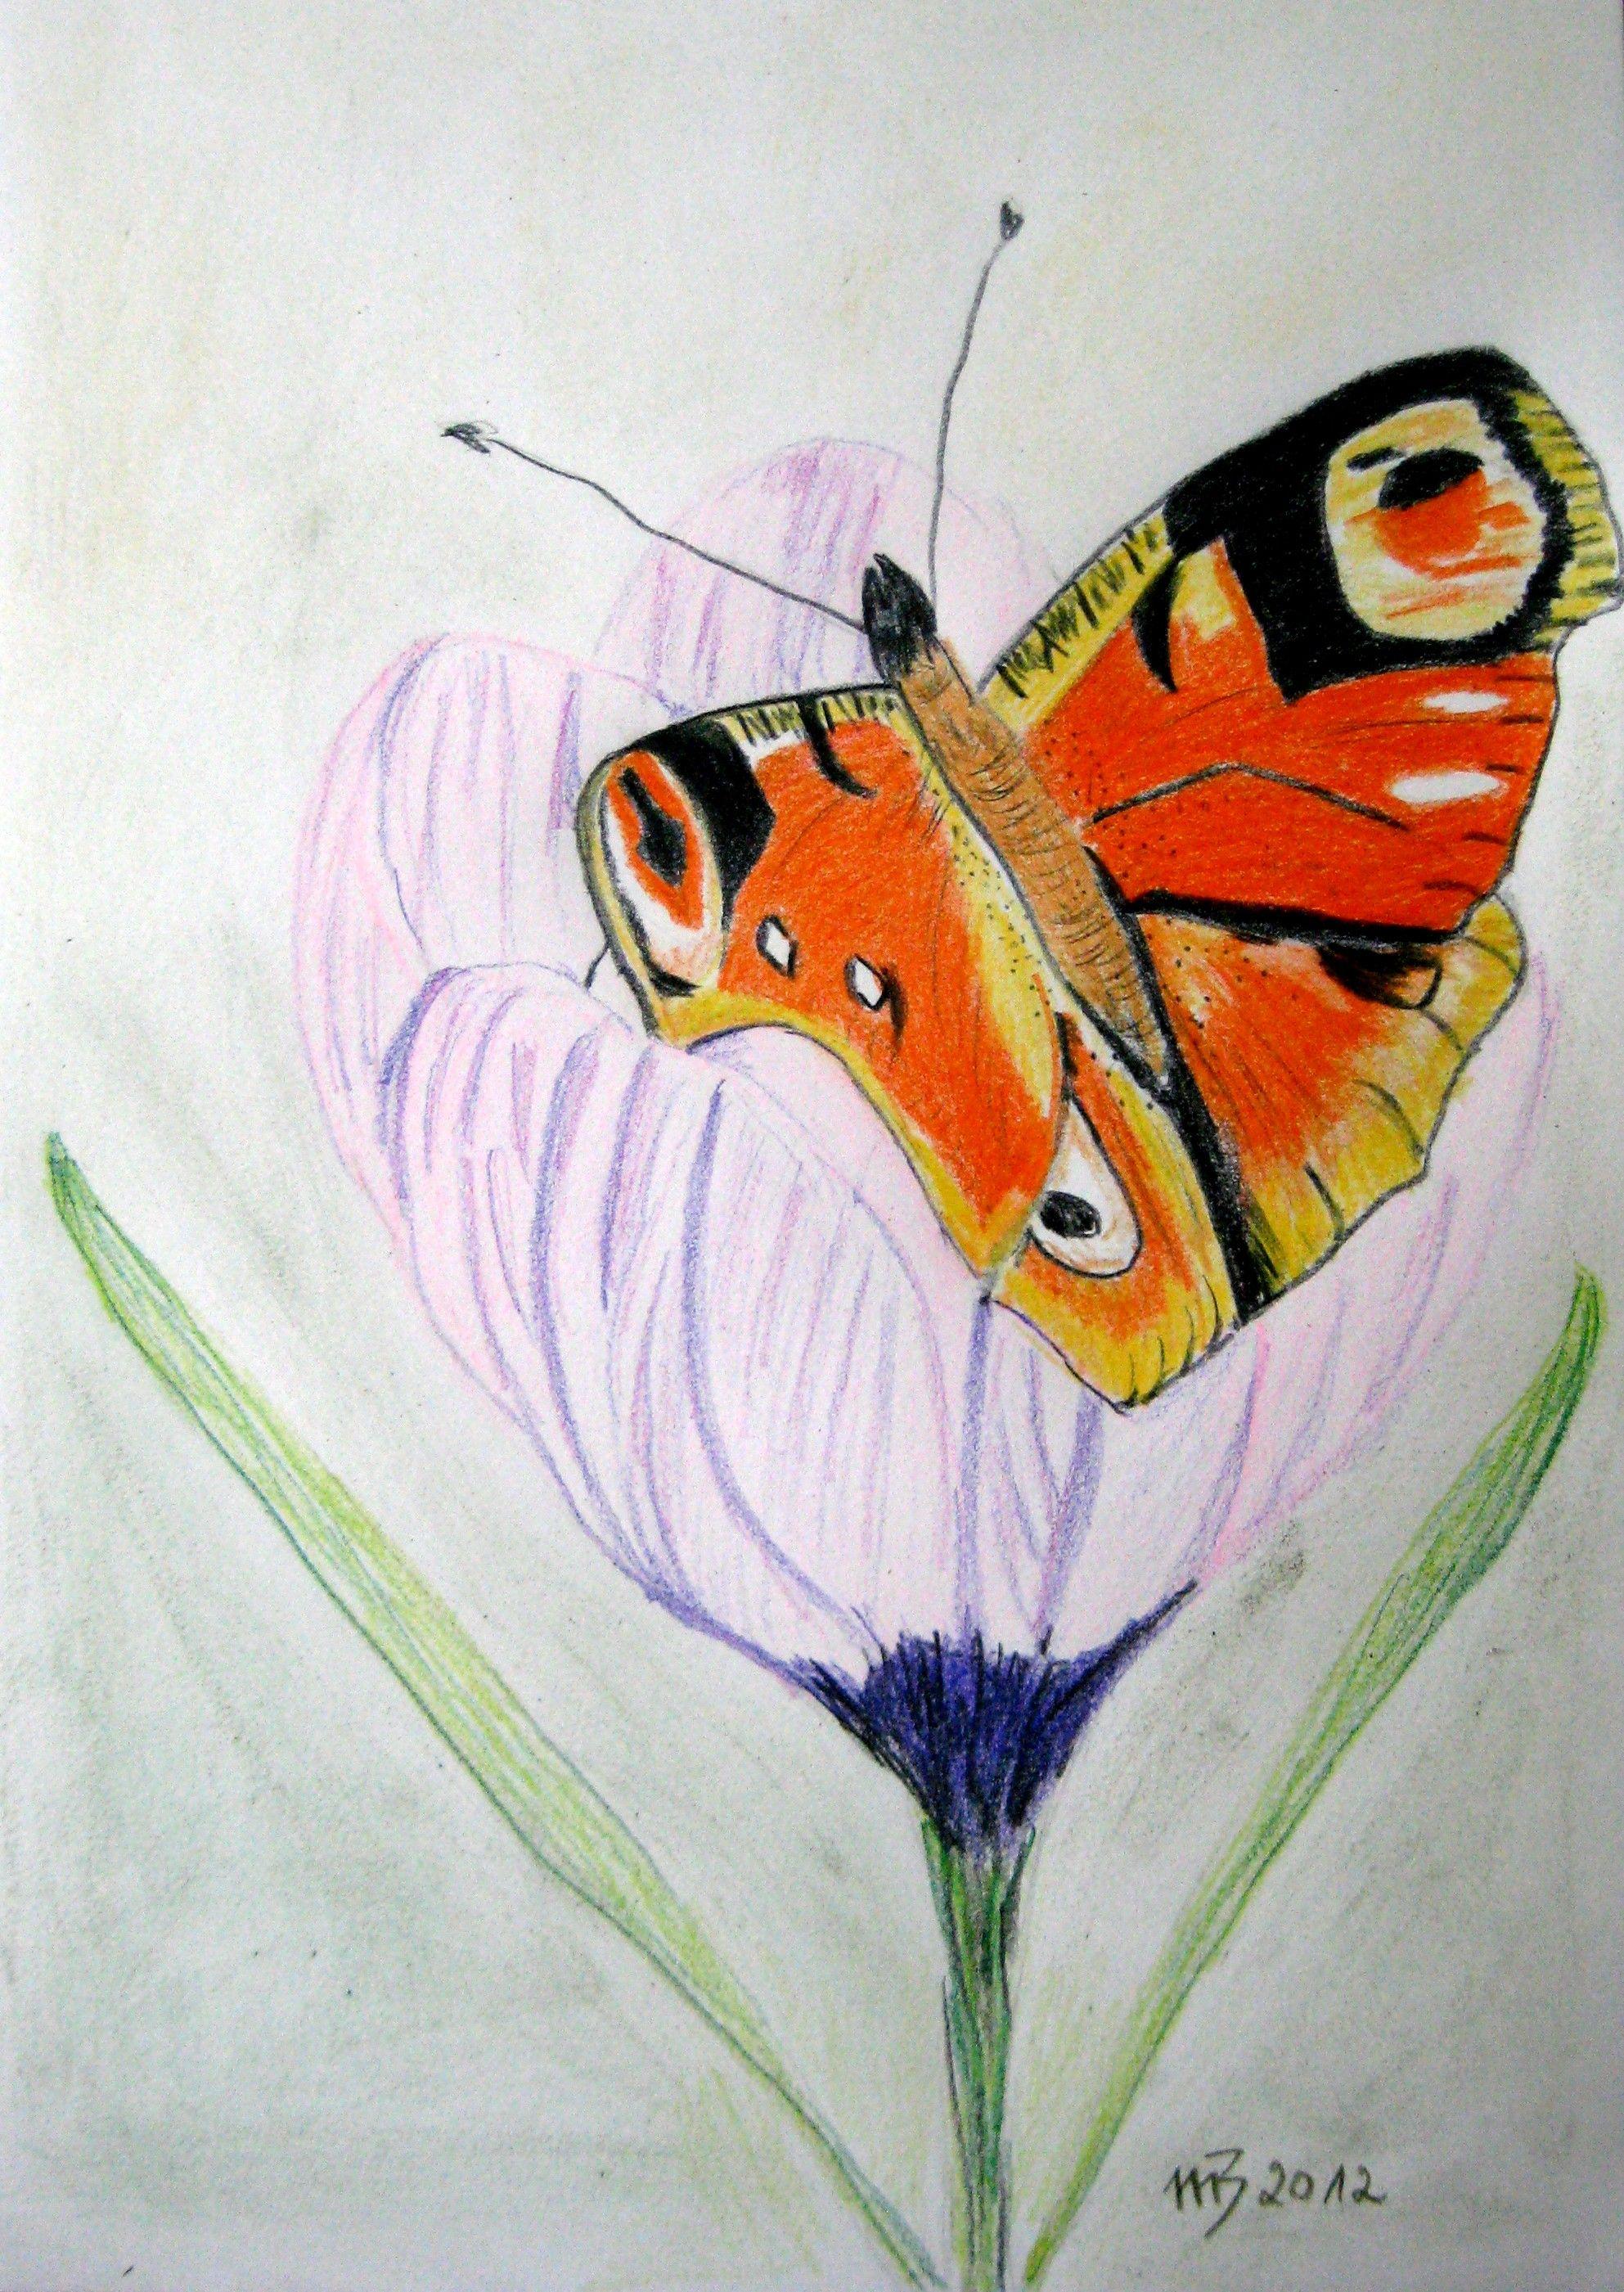 Frühlingsgruß, Buntstift, 30 x 21 cm